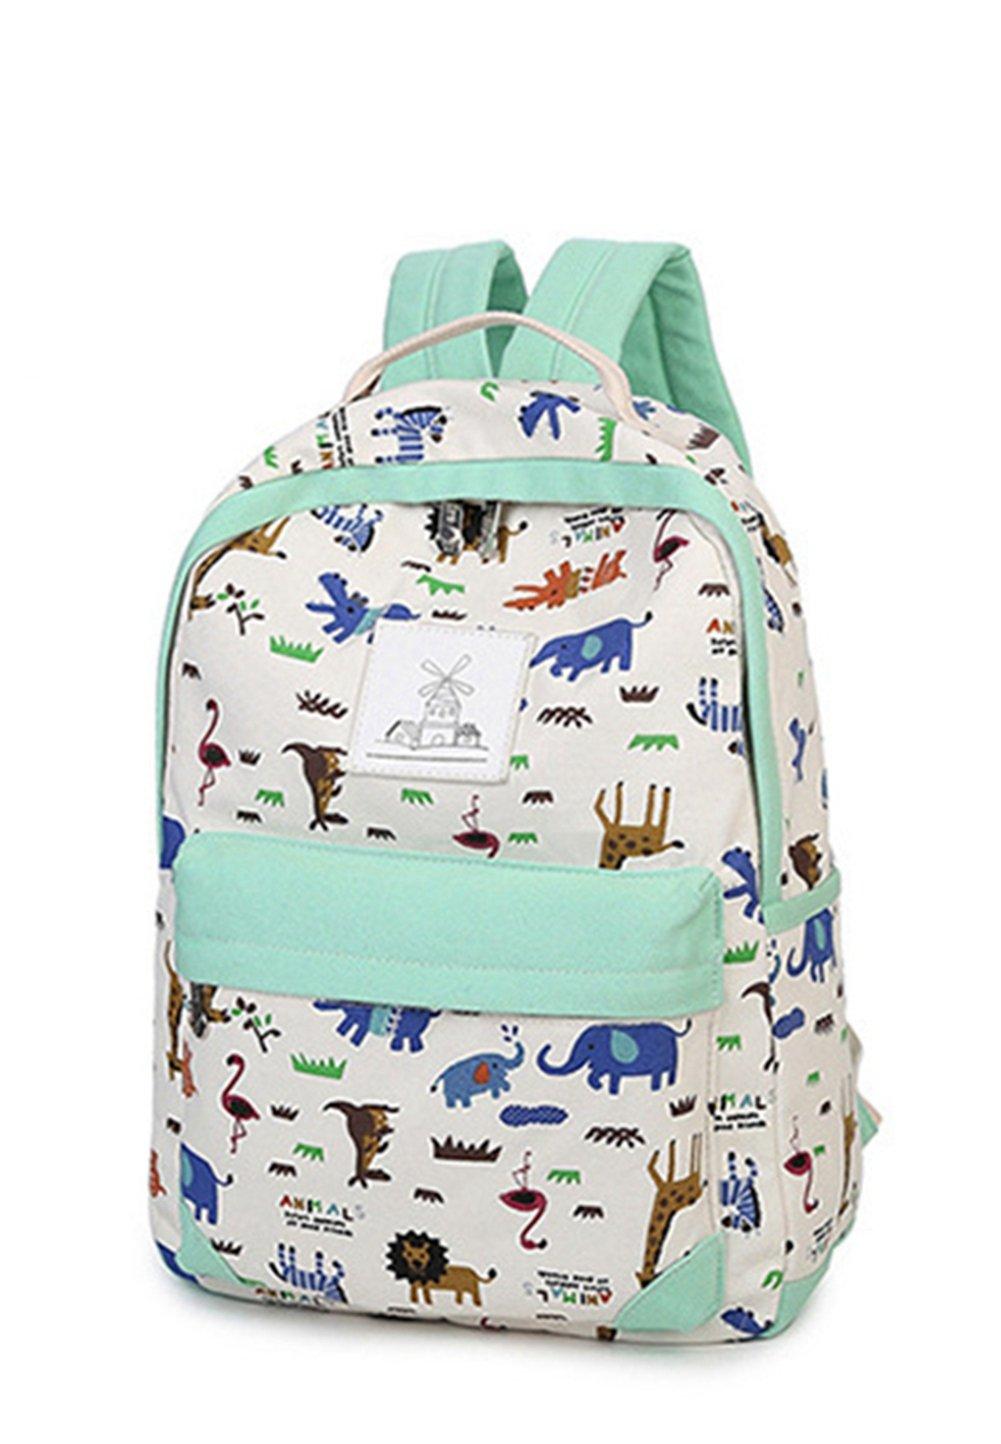 Zehui Women bags Backpack Girl Shoulder Bag Rucksack Canvas Travel School bags Set Green Green